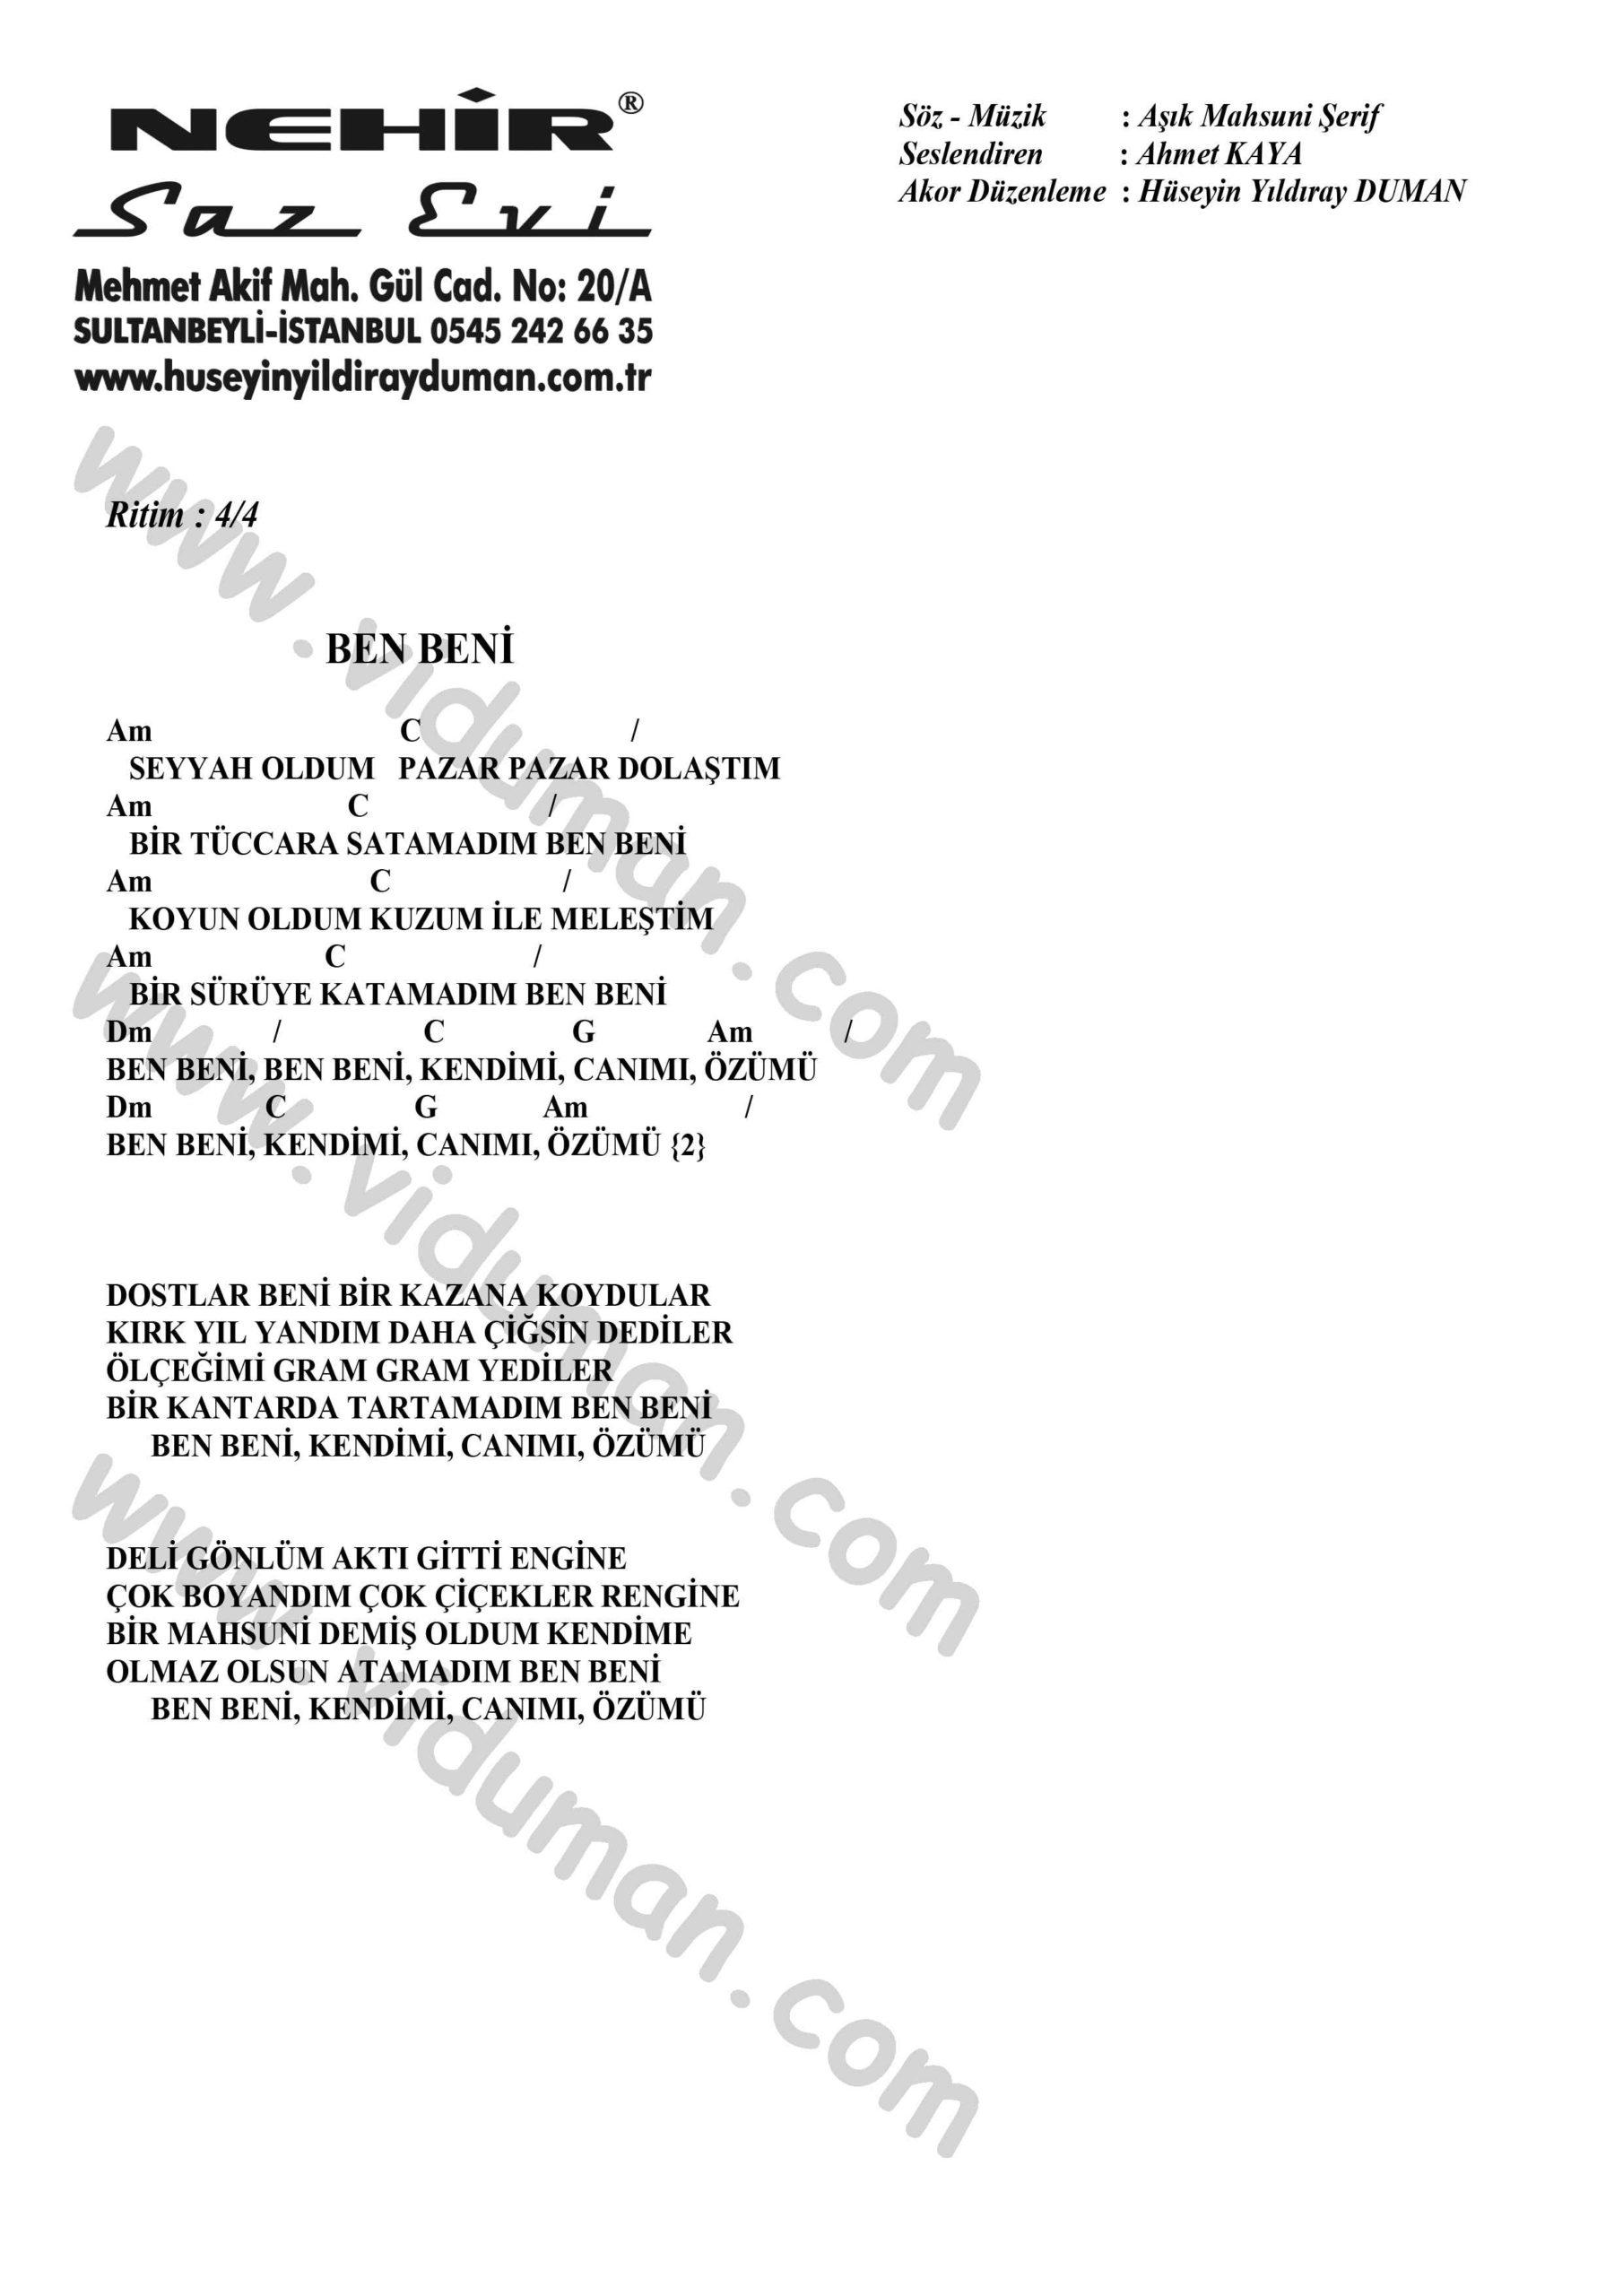 Ben Beni-Ahmet Kaya-Ritim Gitar Akorlari